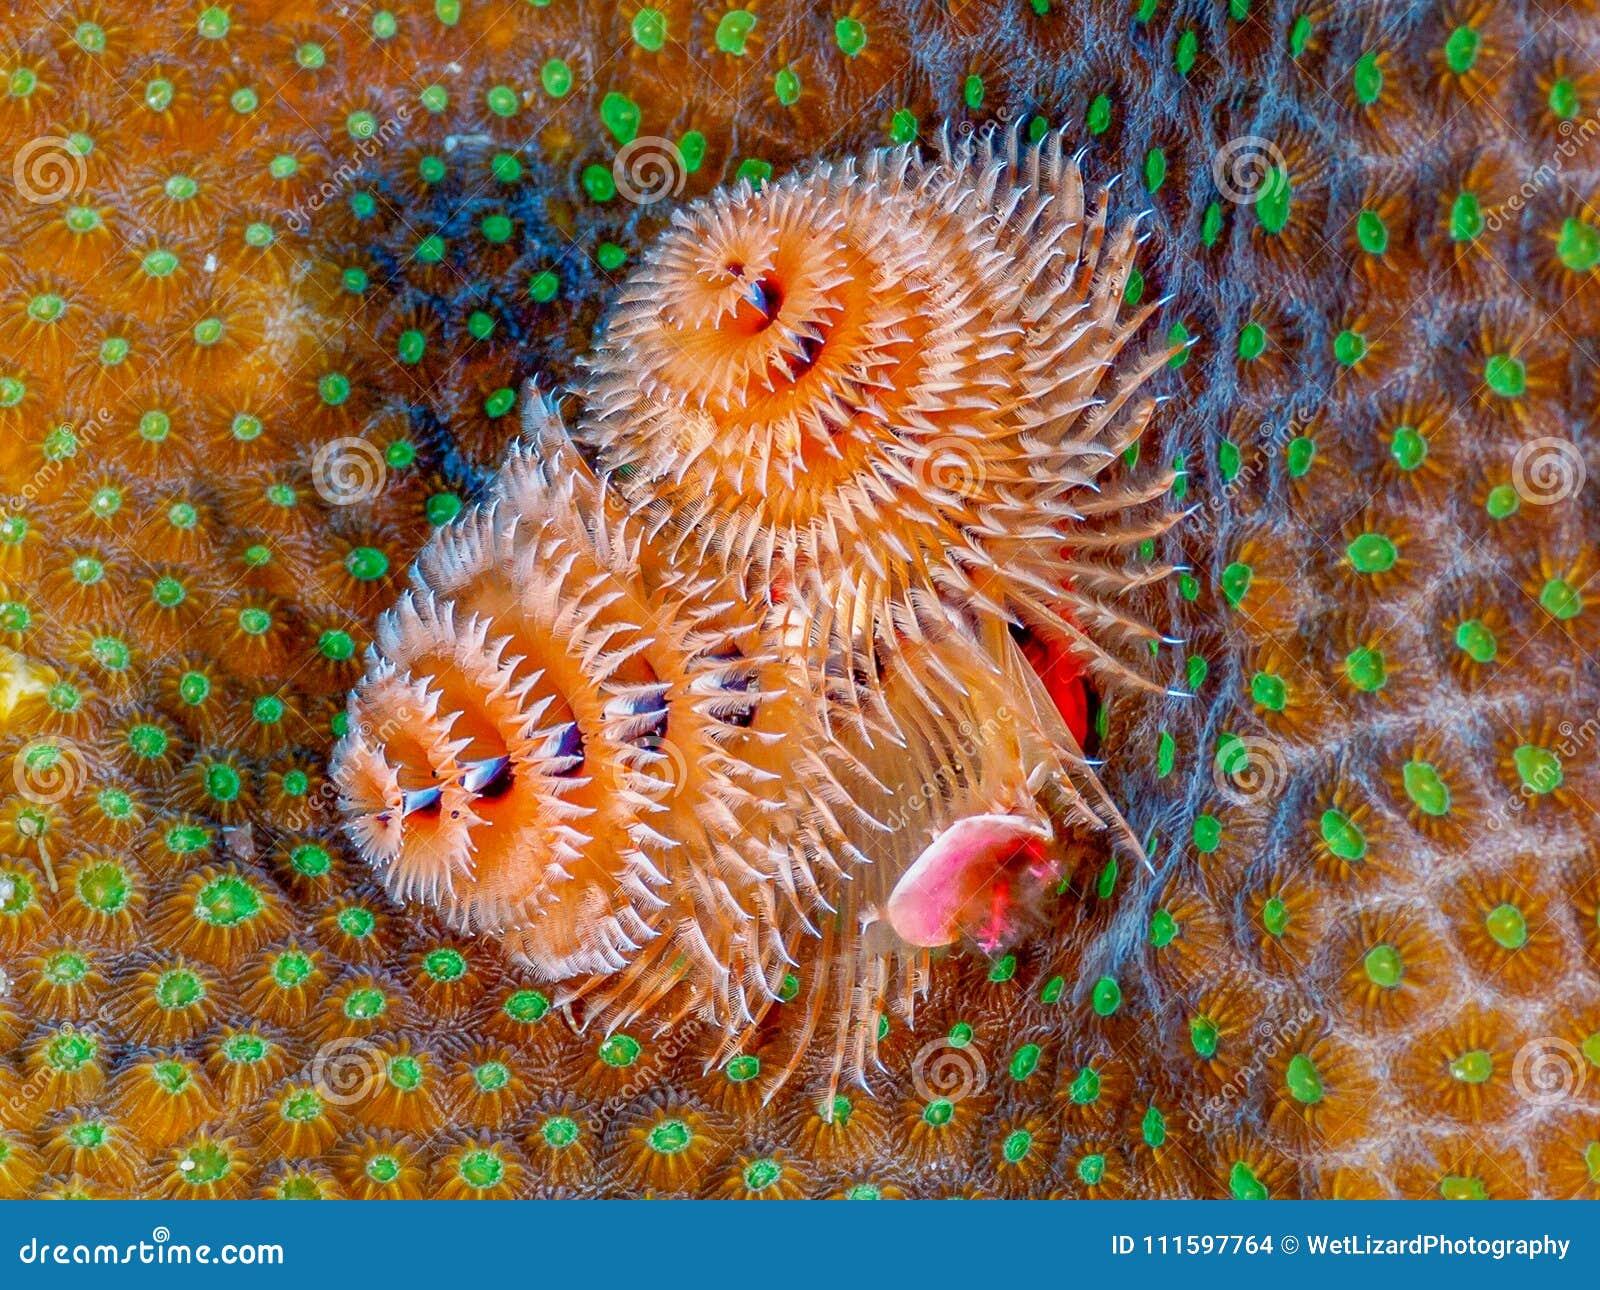 Christmas Tree Worm.Christmas Tree Worm On Star Coral Stock Photo Image Of